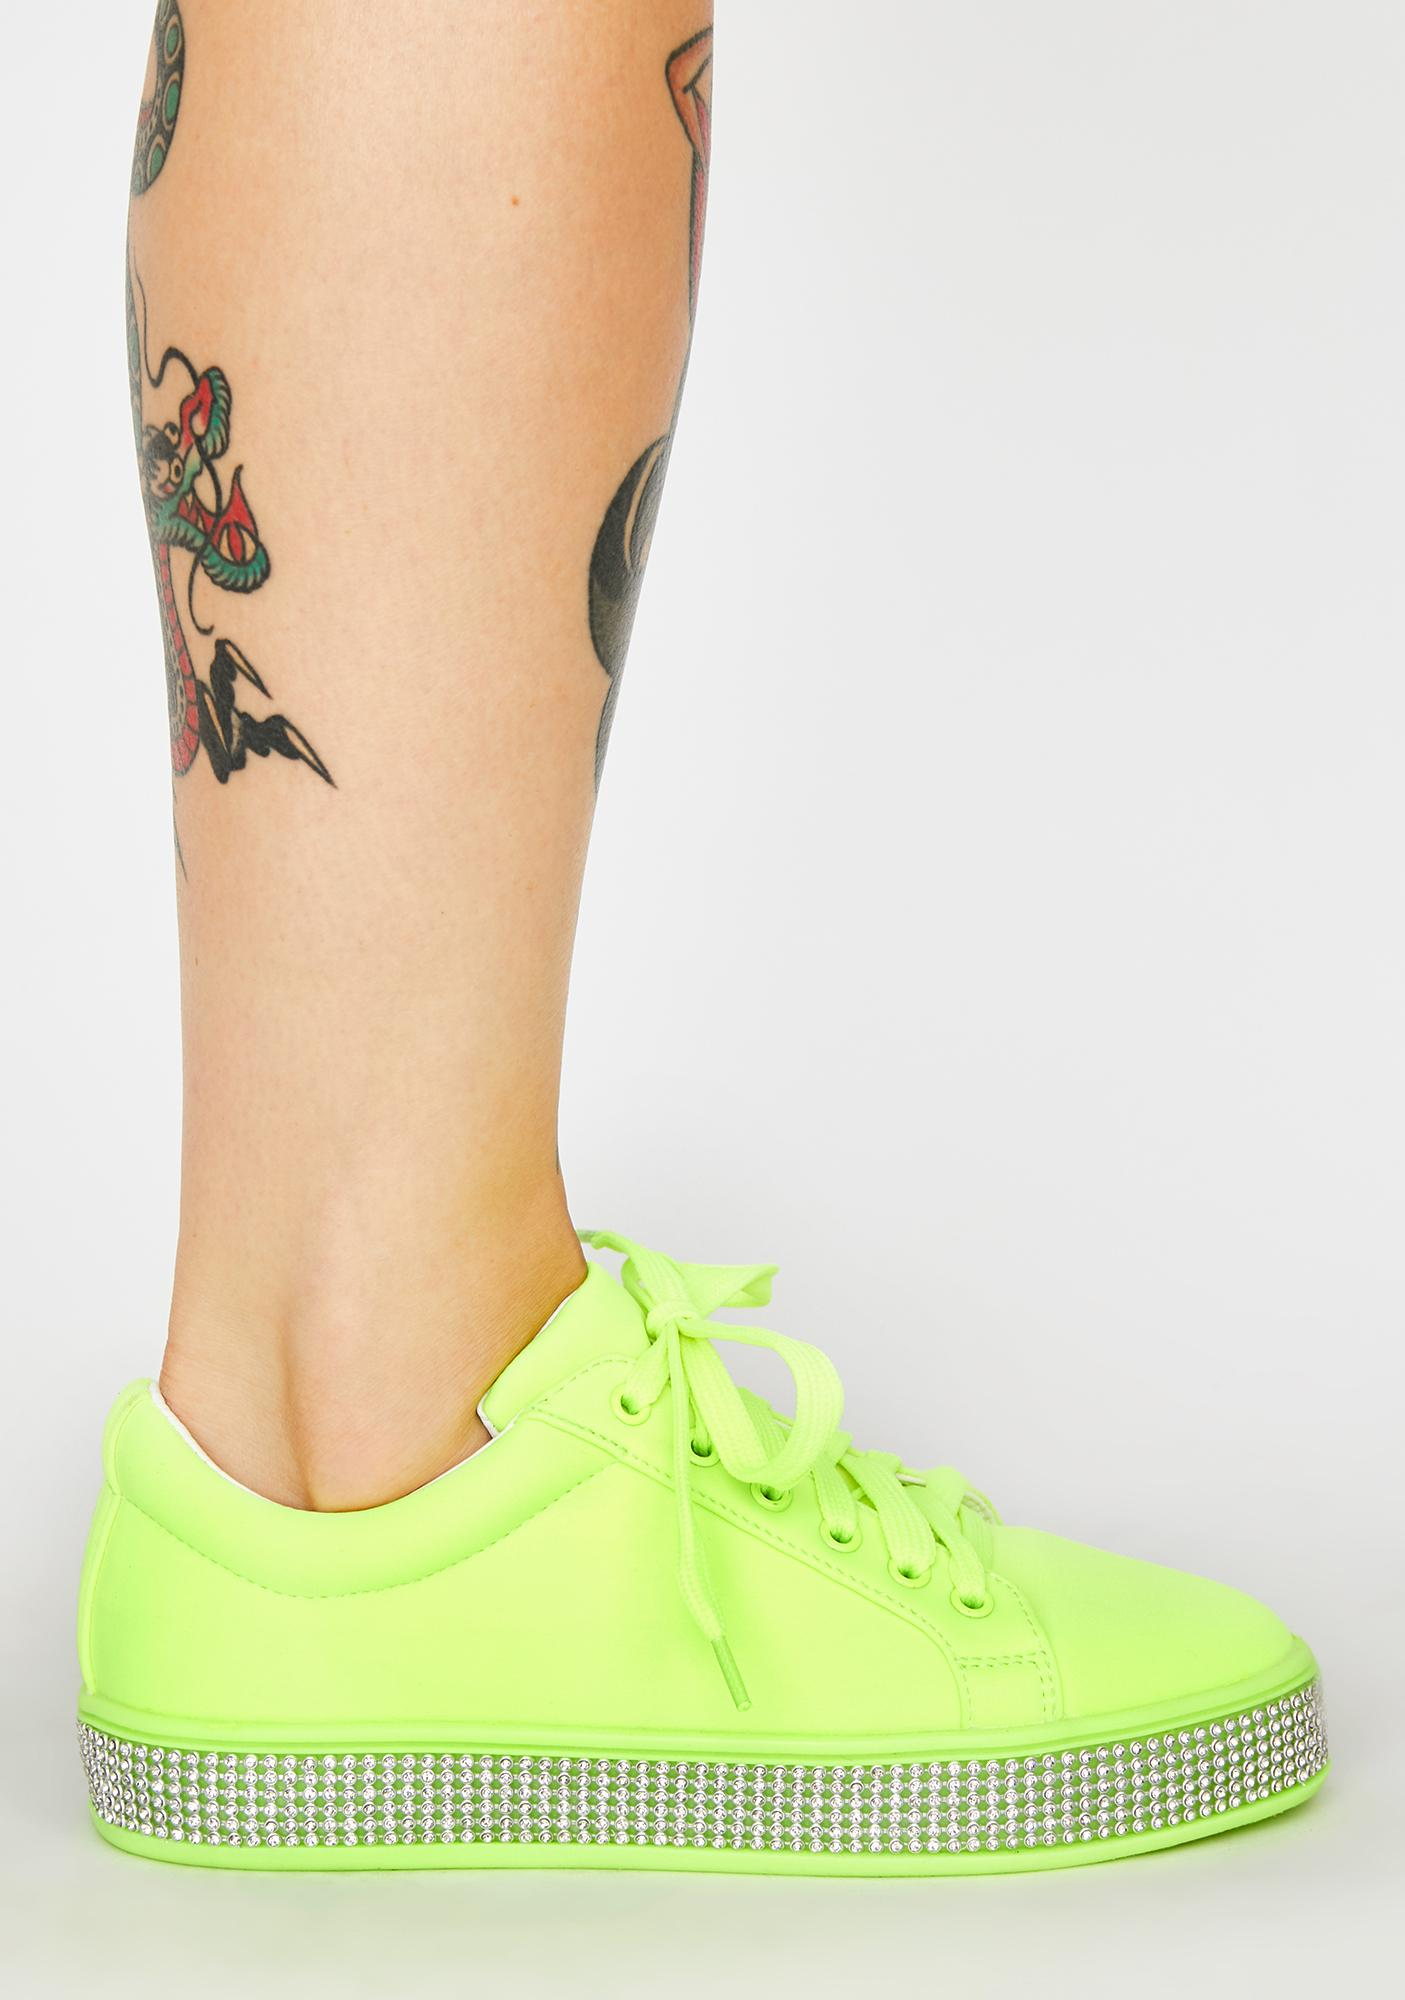 Toxic On The Roxxx Rhinestone Sneakers